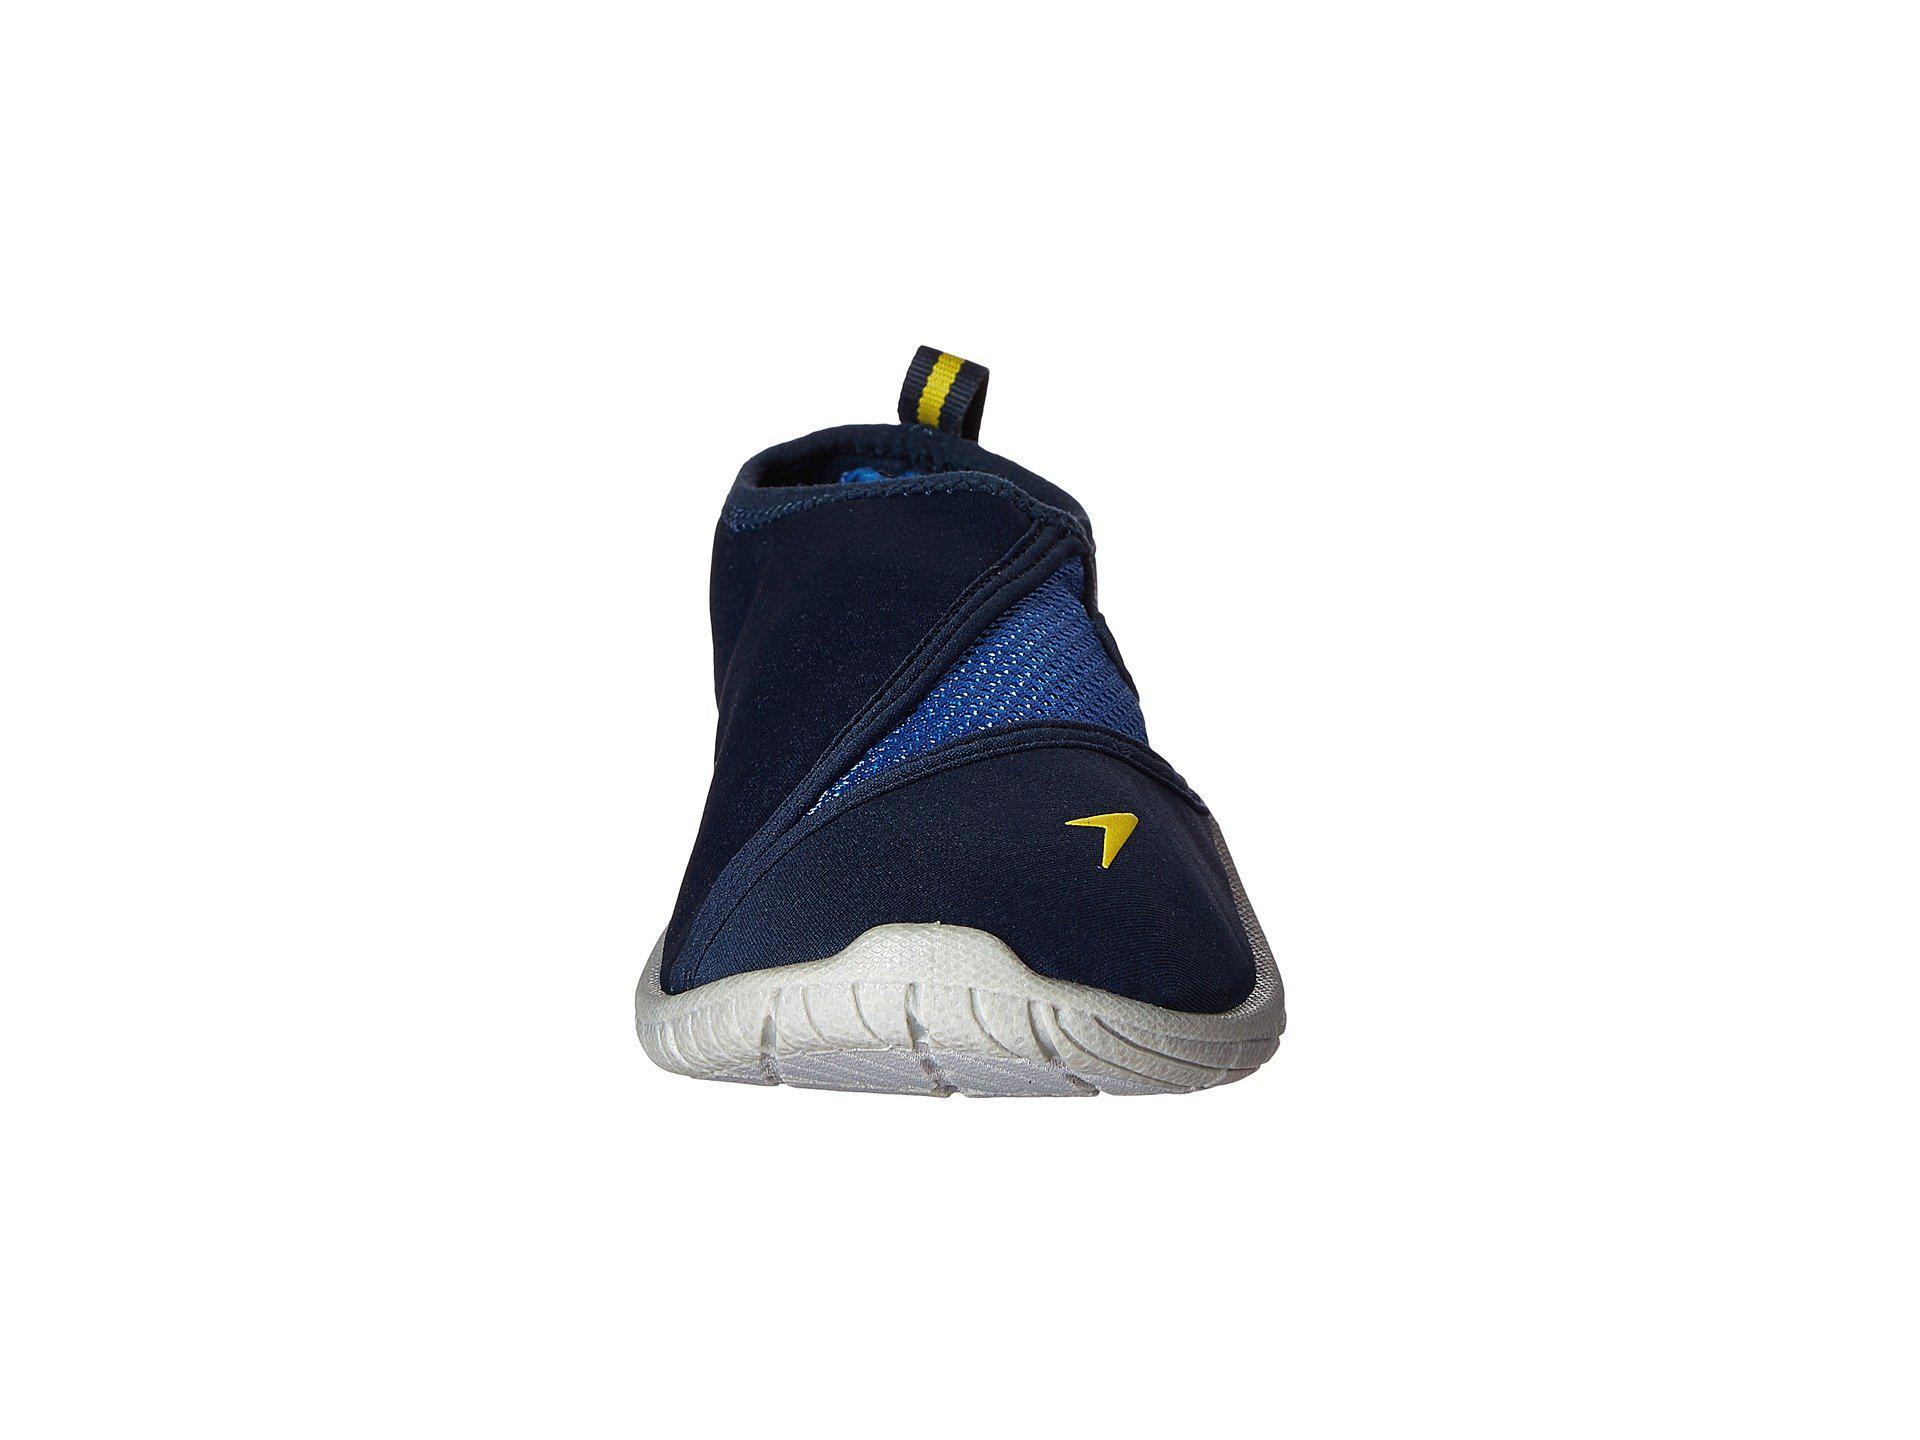 6987146724b1 Speedo - Blue Surfwalker Pro 3.0 (black white) Women s Shoes - Lyst. View  fullscreen